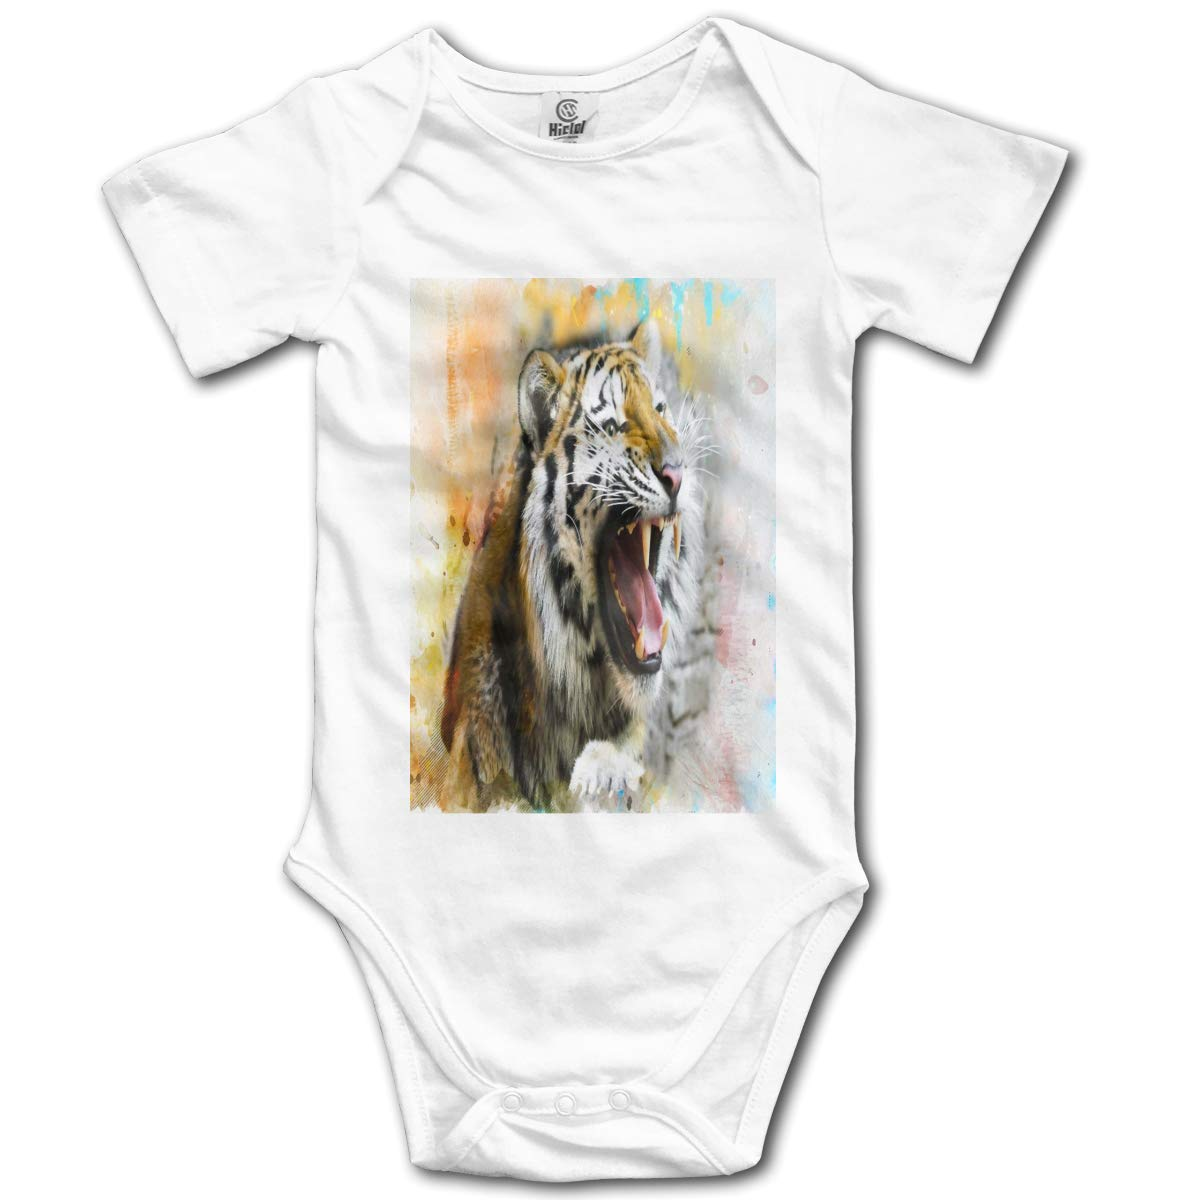 Tiger Paint Splash Colorful Boys /& Girls Black Short Sleeve Romper Bodysuits for 0-24 Months